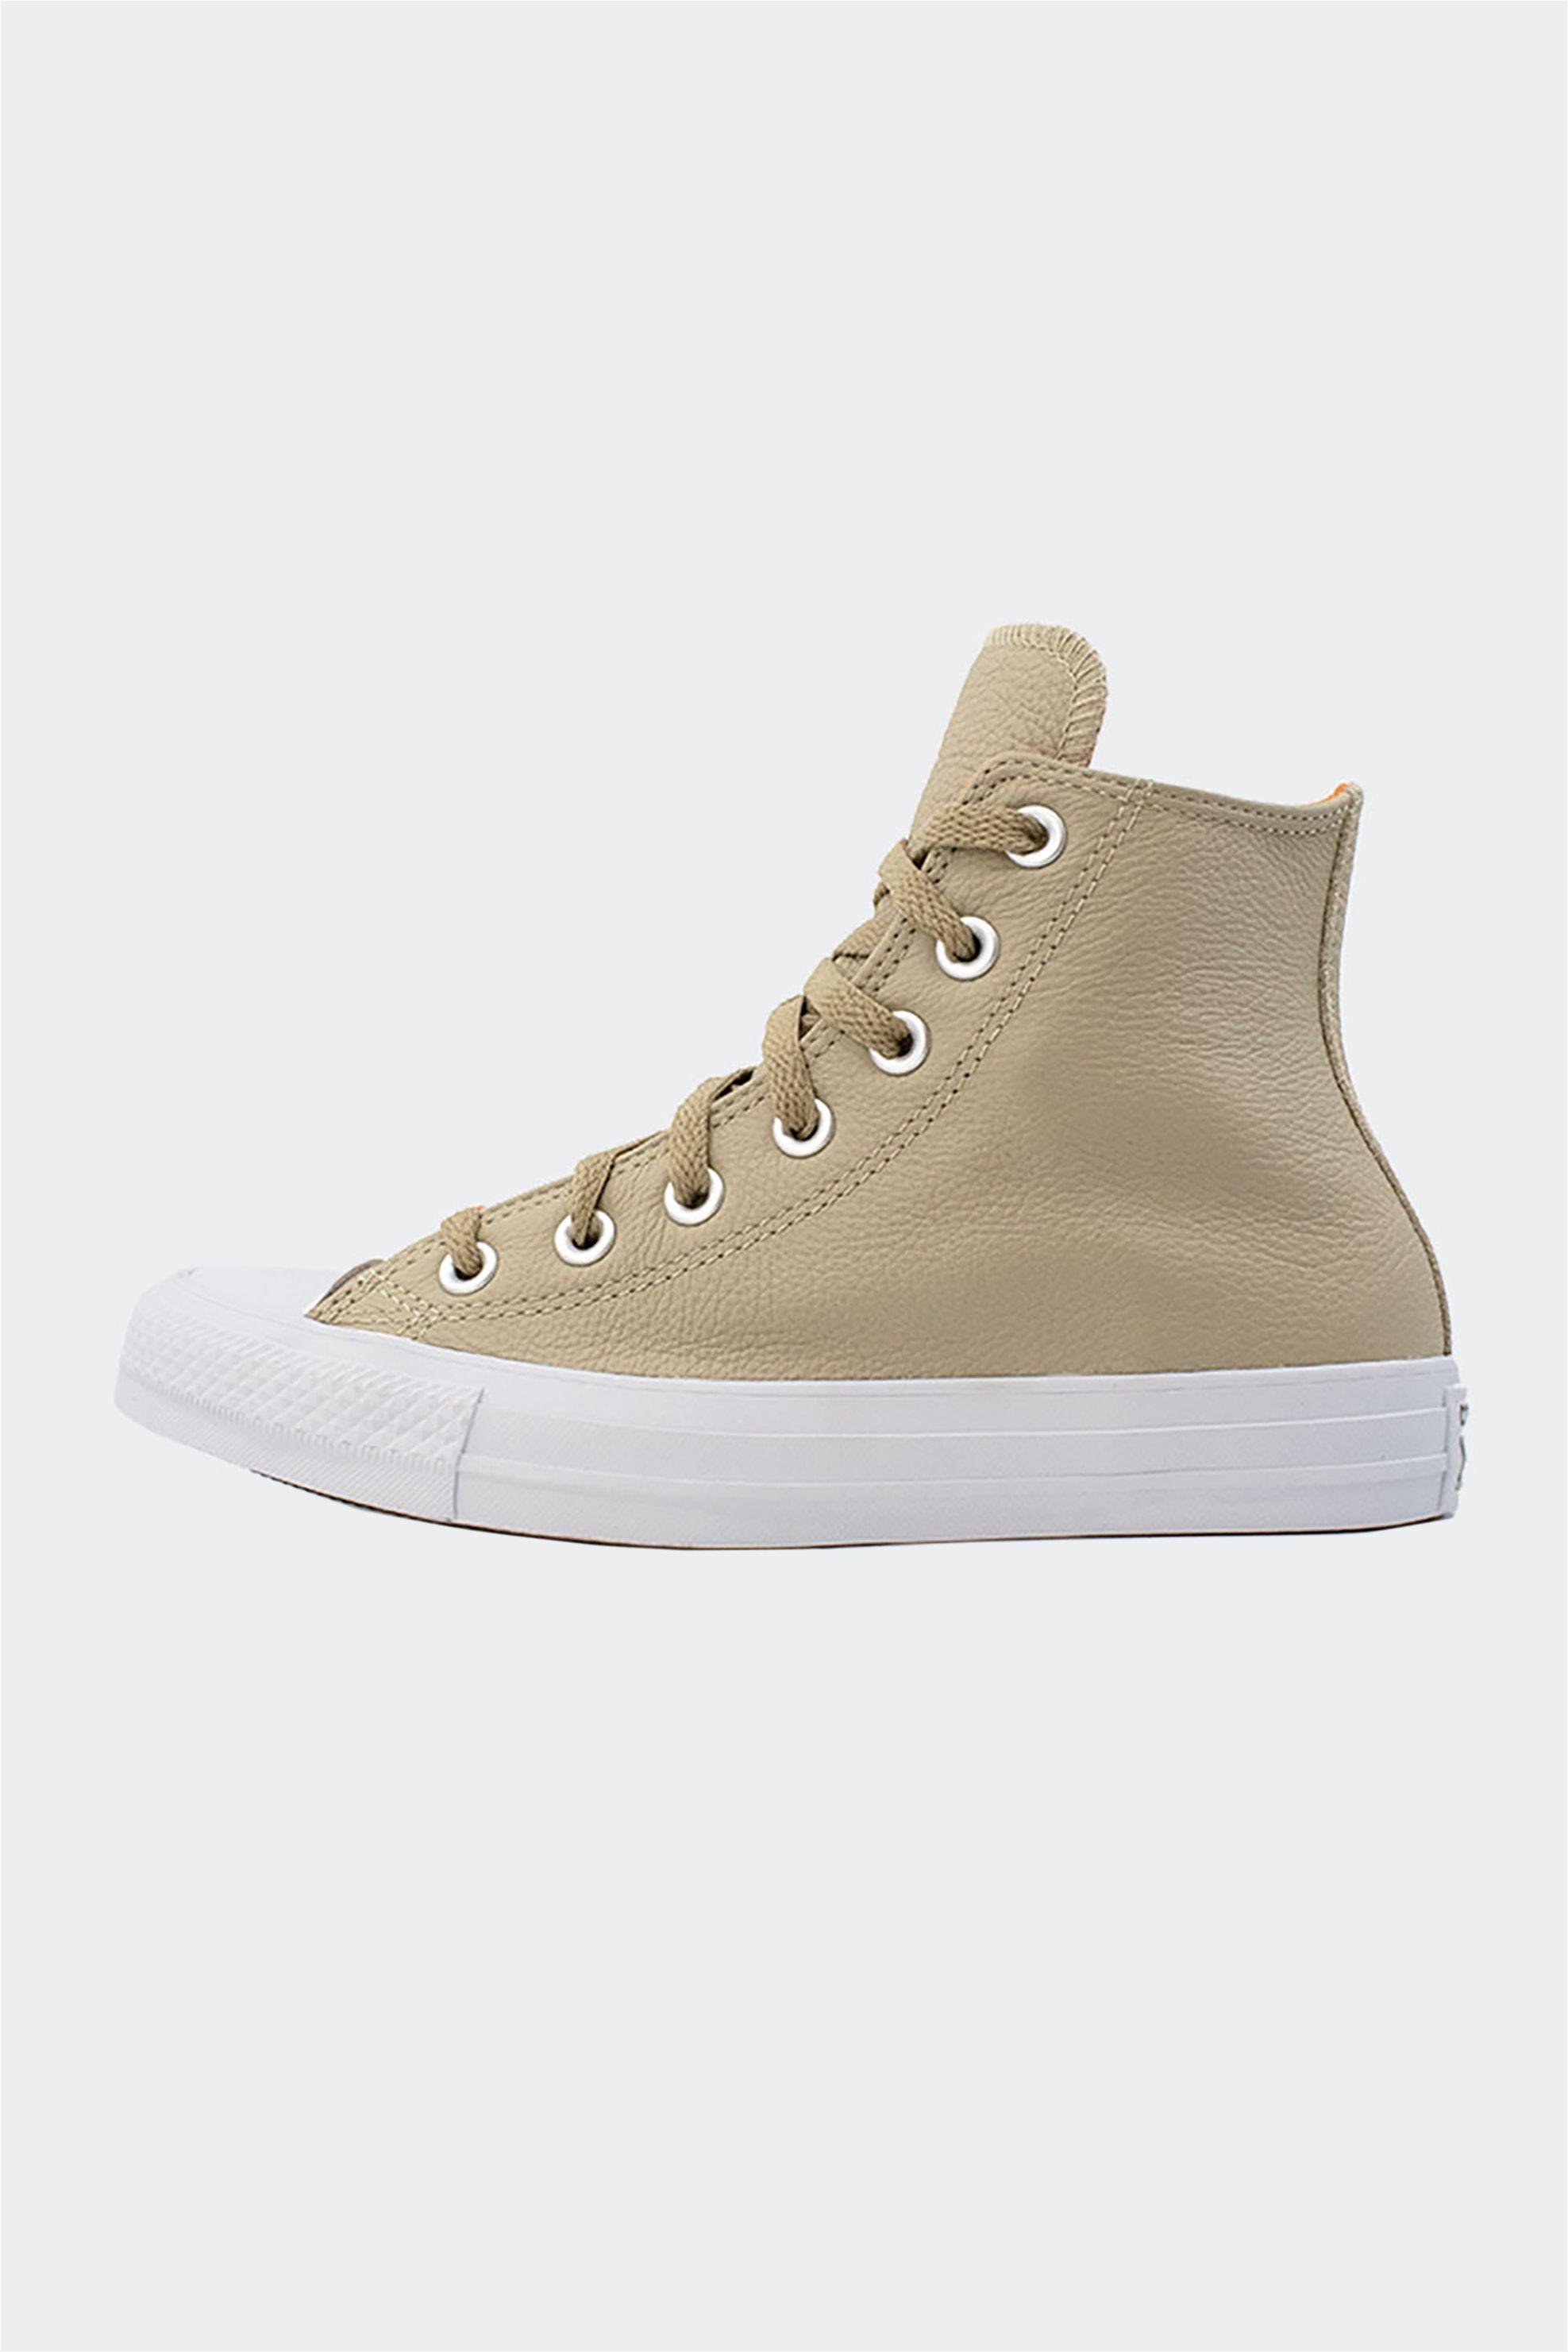 "Converse γυναικεία sneakers μποτάκια ""All Star Chuck Taylor Hi"" – 571624C – Μπεζ"